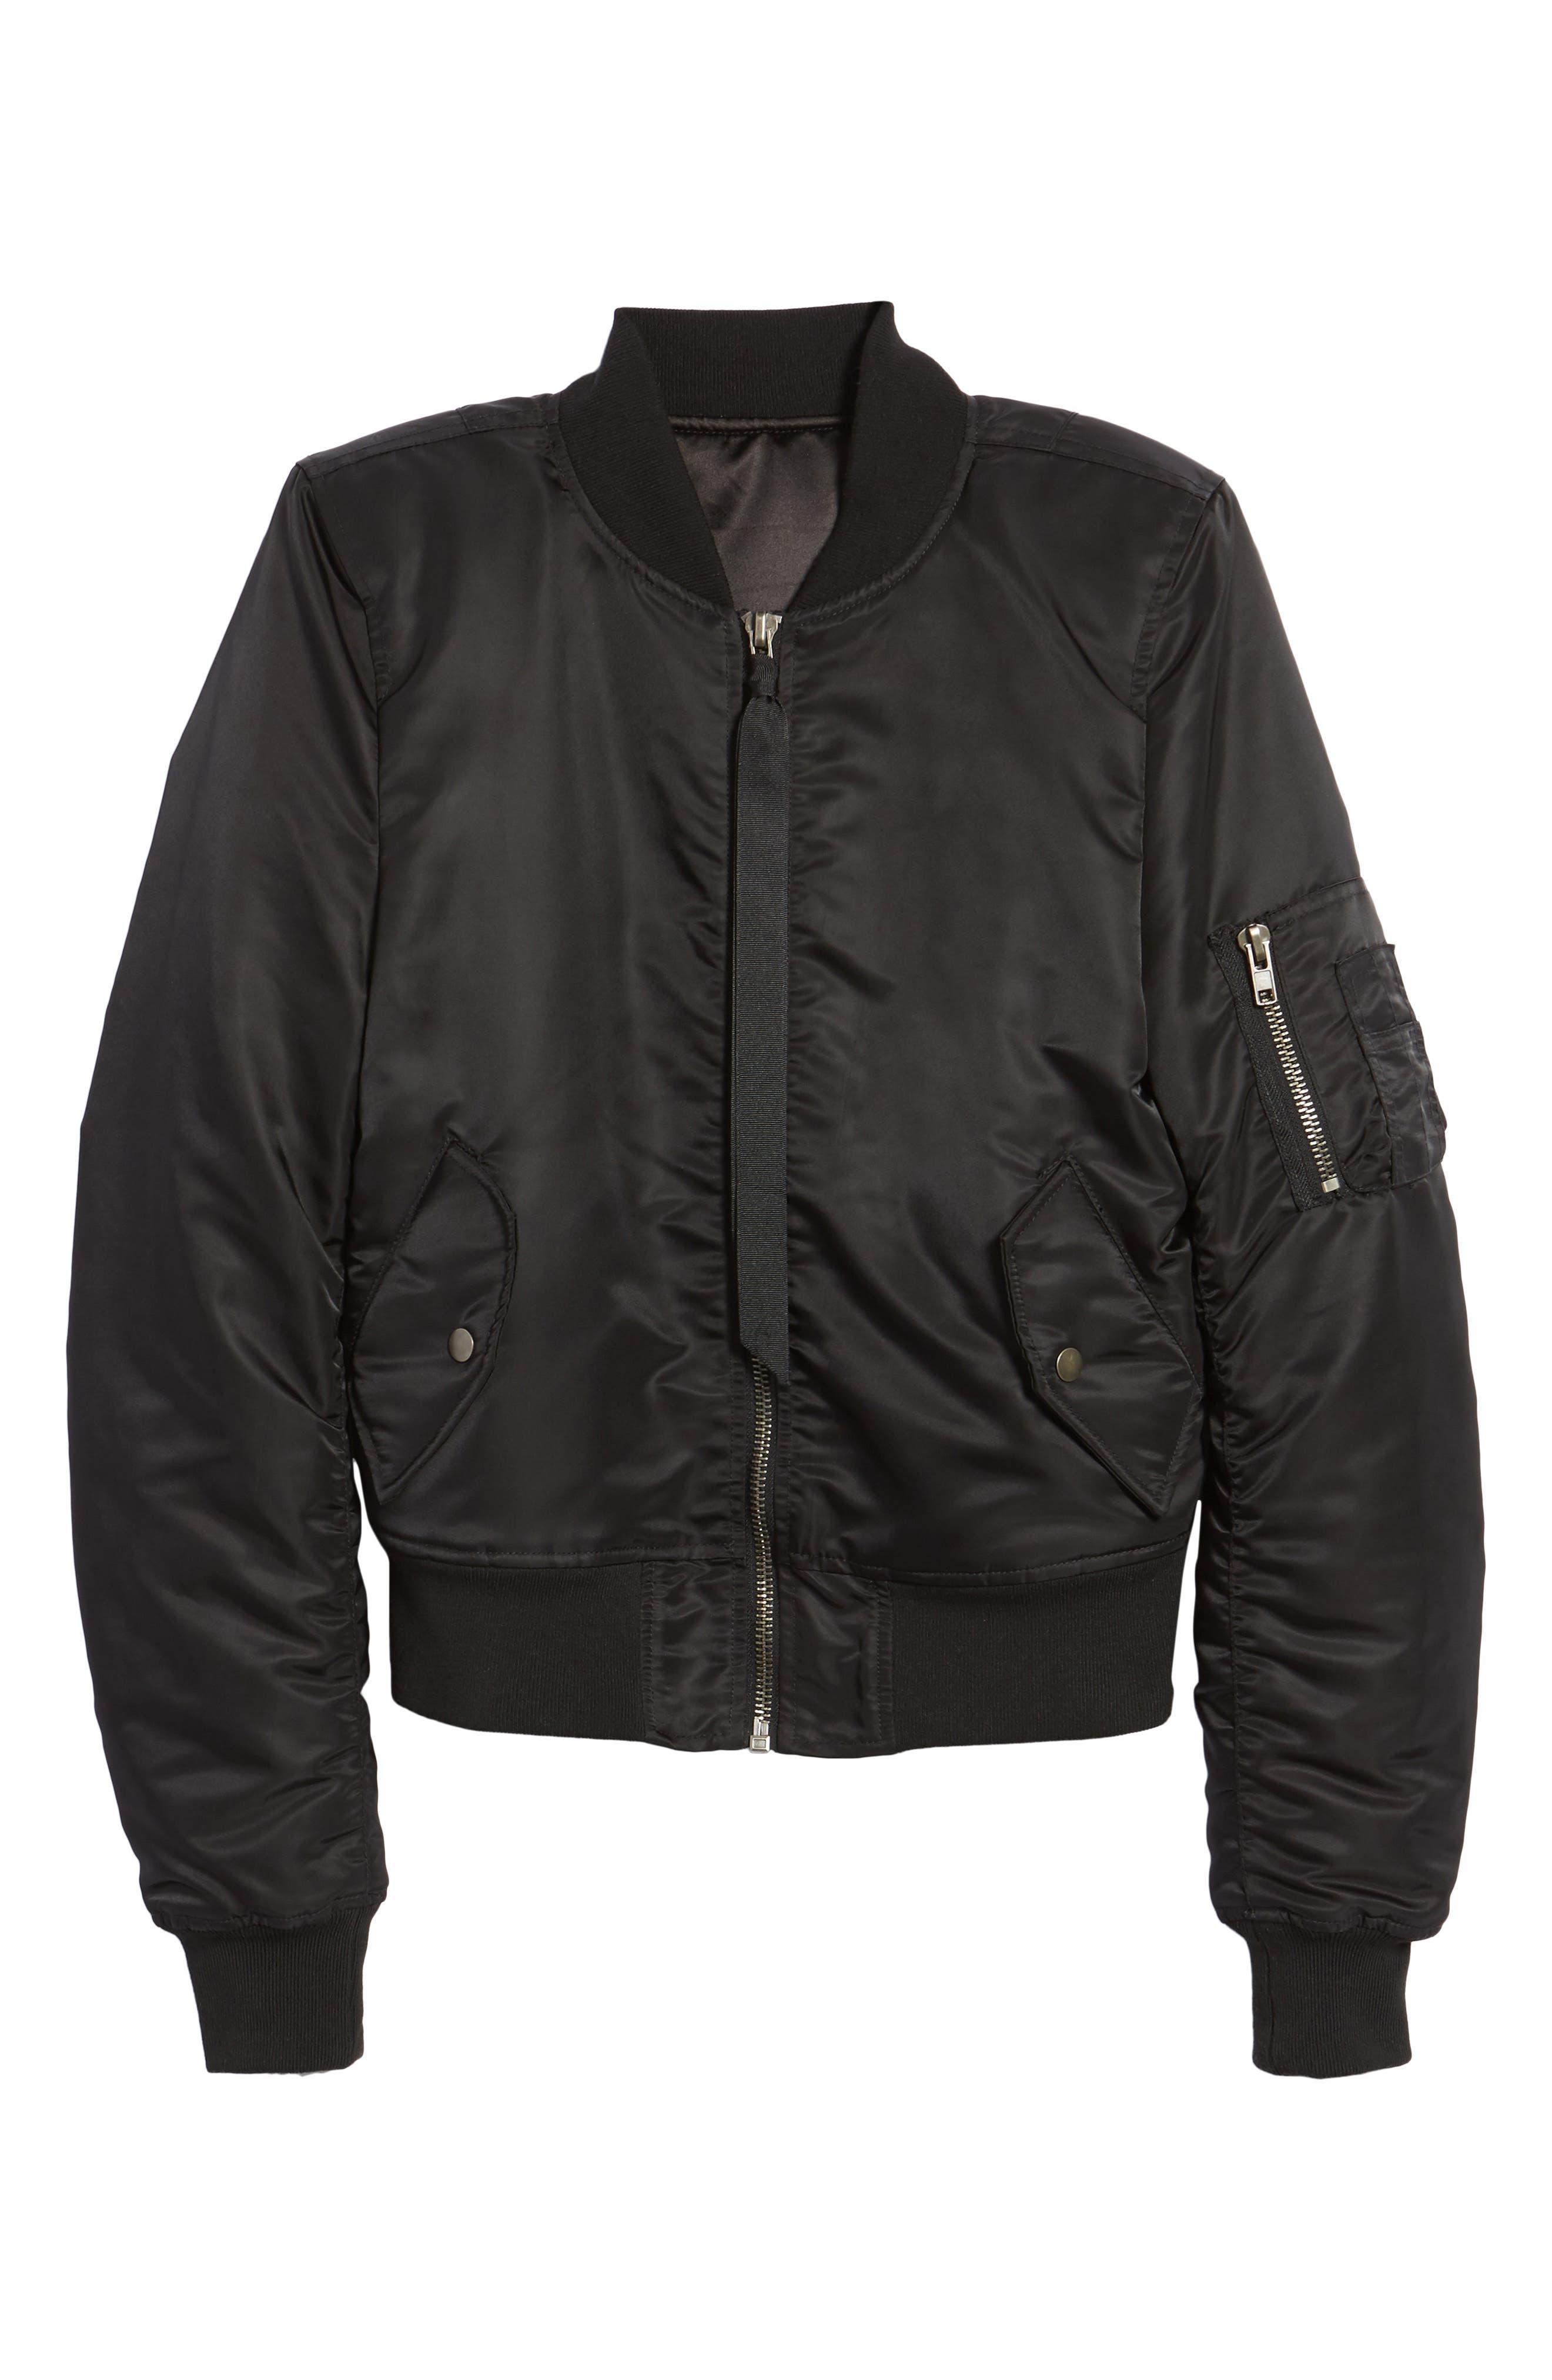 Bomber Jacket,                             Alternate thumbnail 6, color,                             Noir